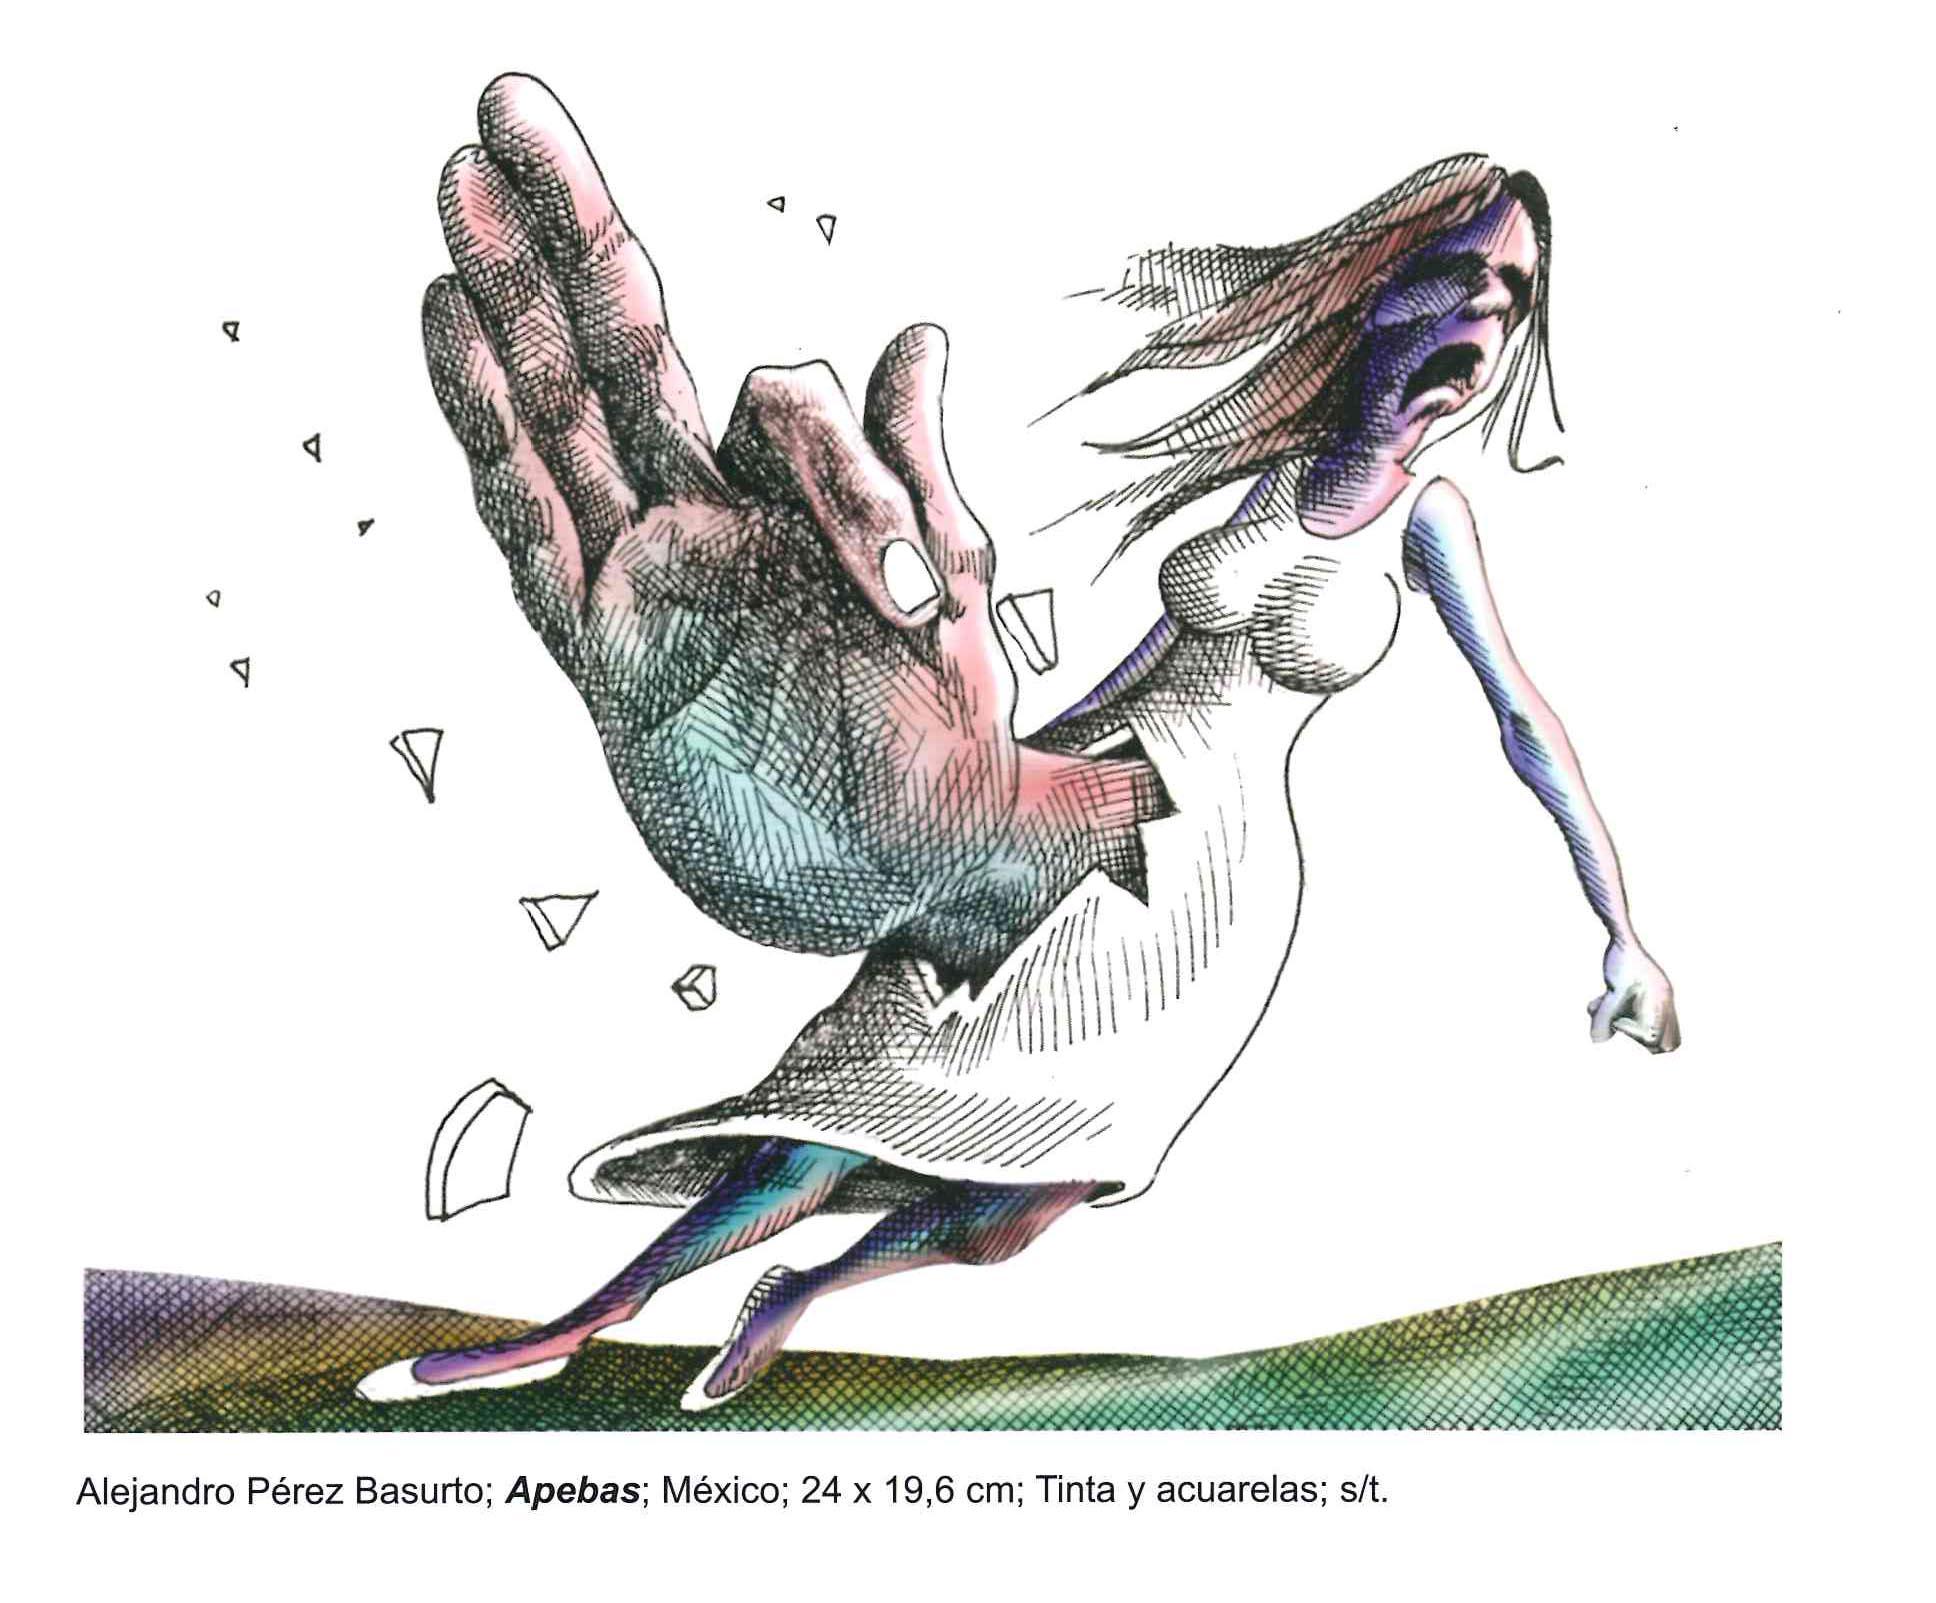 http://adolescentesinviolenciadegenero.com/wp-content/uploads/2014/01/cat%C3%A1logo-exposici%C3%B3n-violencia-de-genero-apebas.jpg